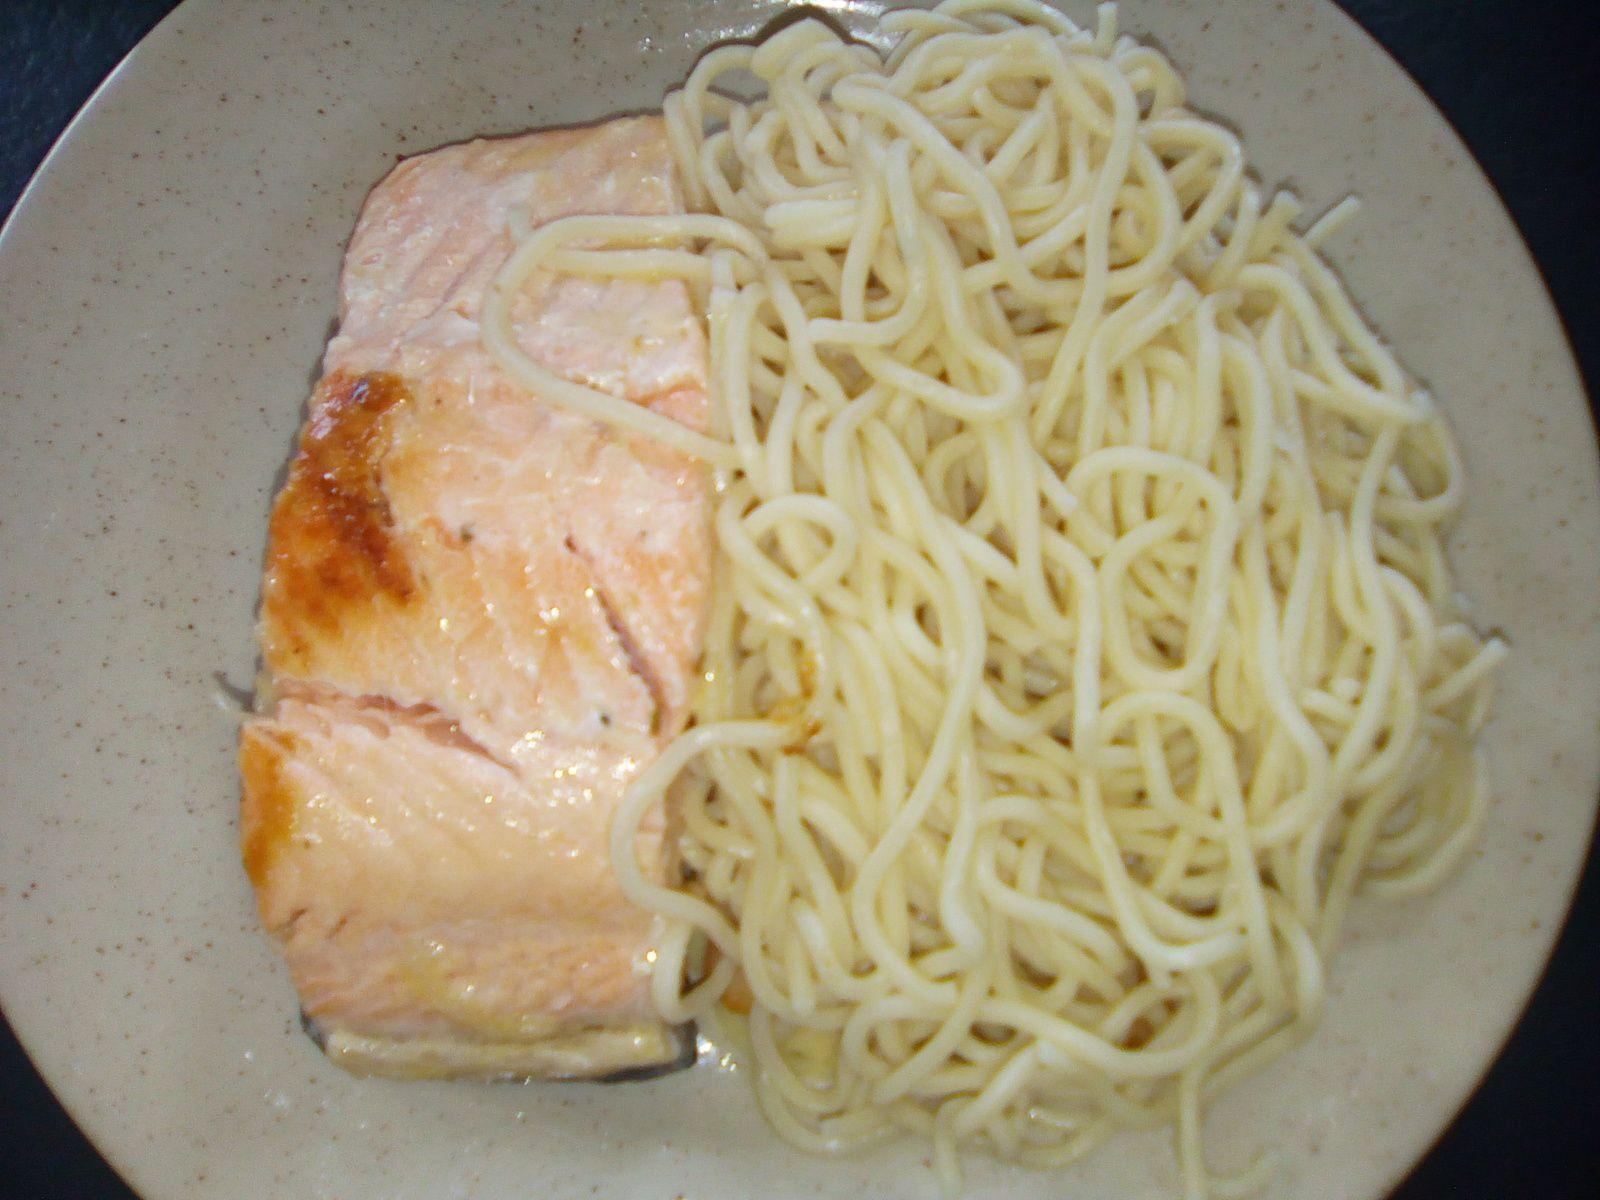 Spaghettis avec le philips pasta maker